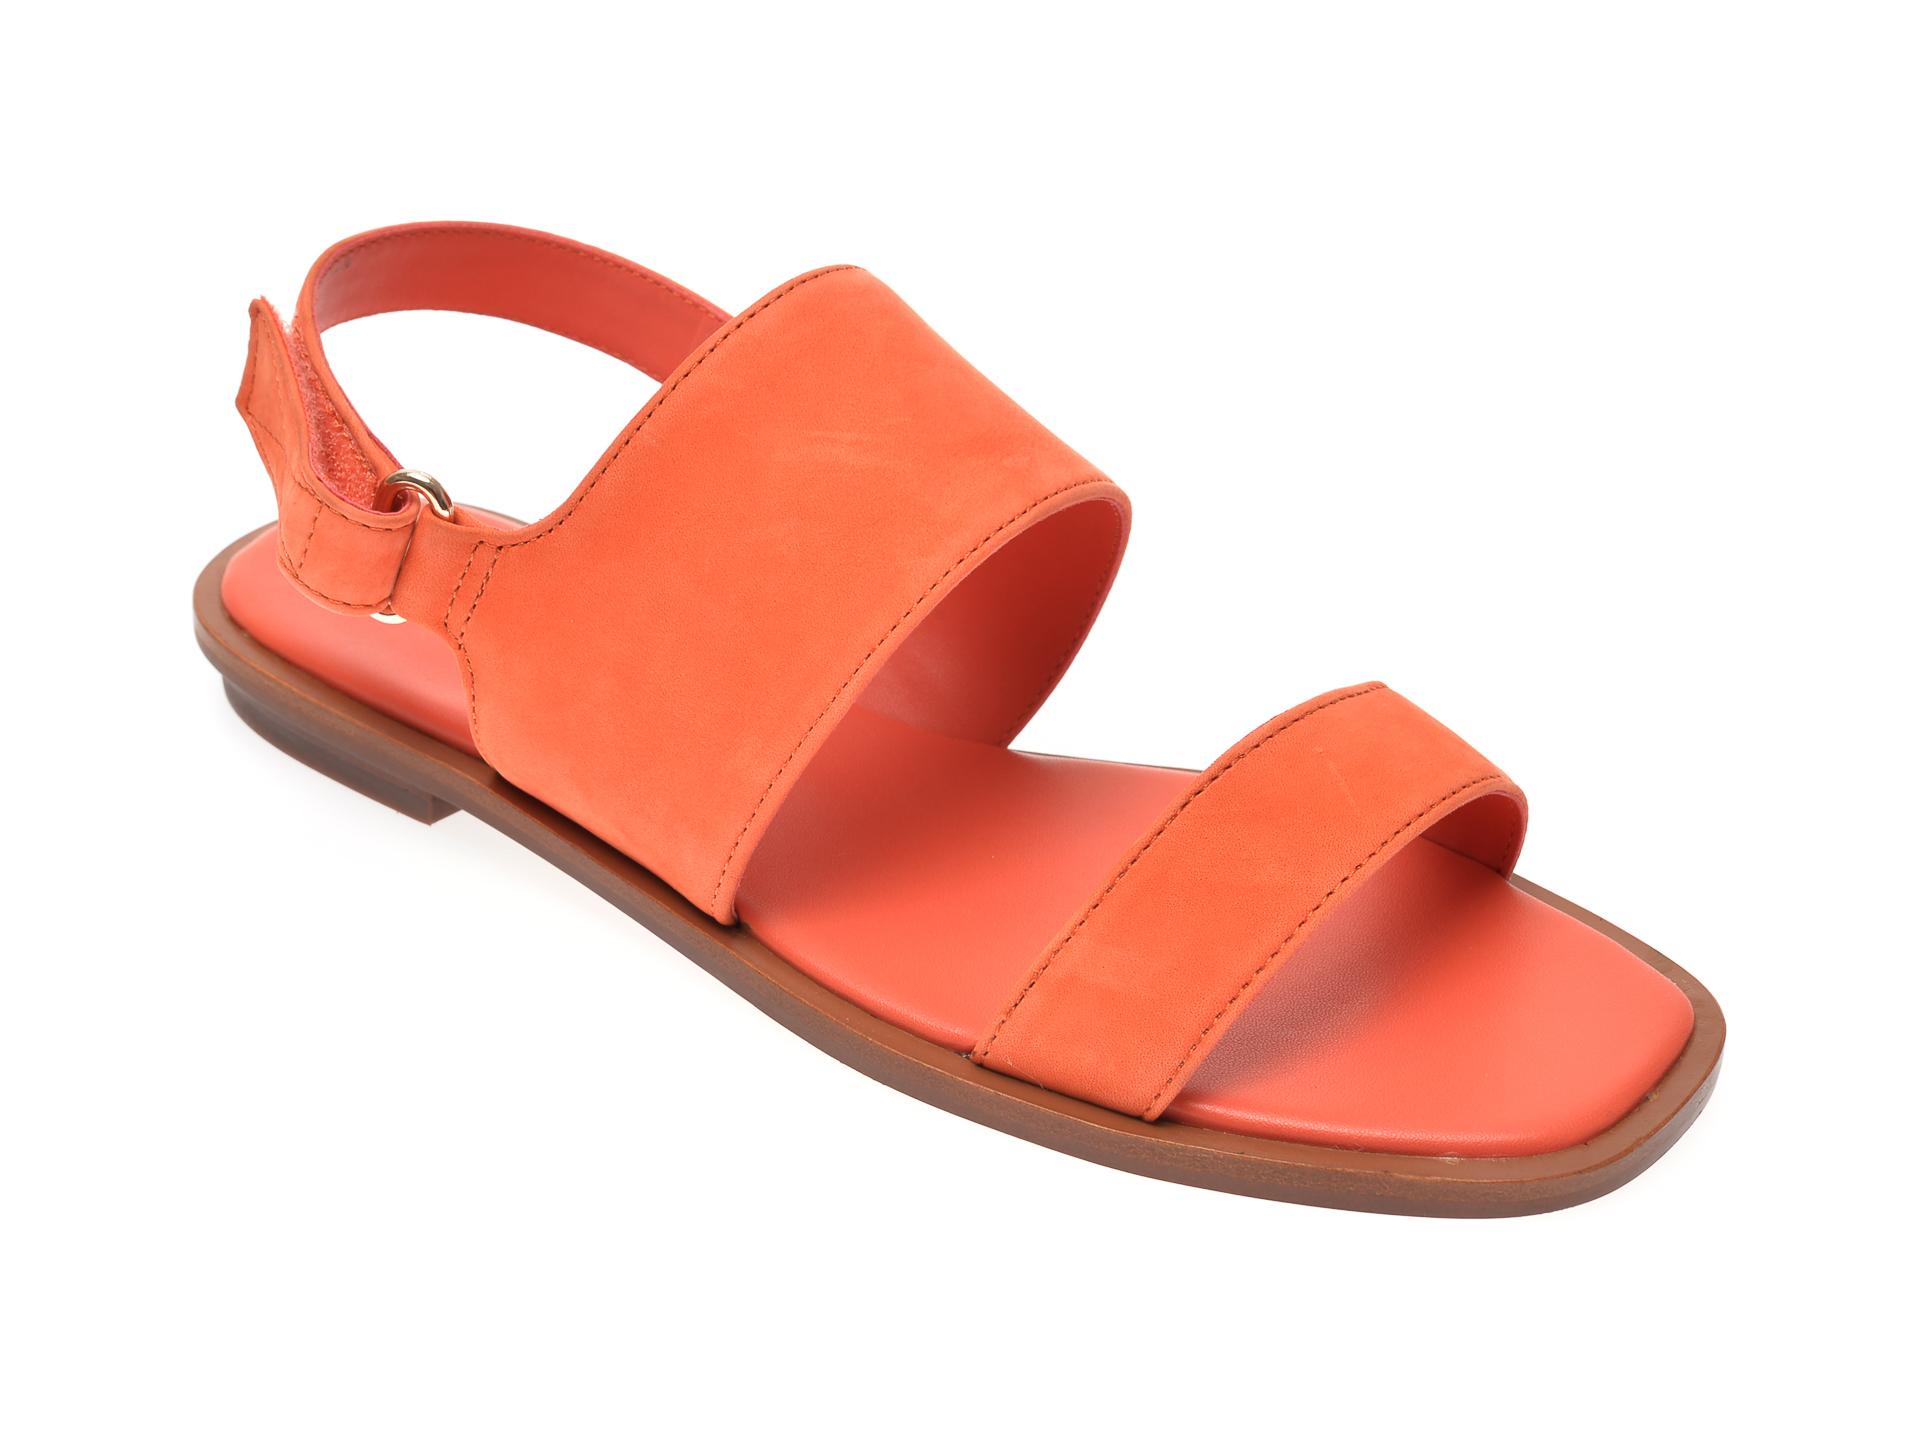 Sandale ALDO portocalii, Sula800, din nabuc imagine otter.ro